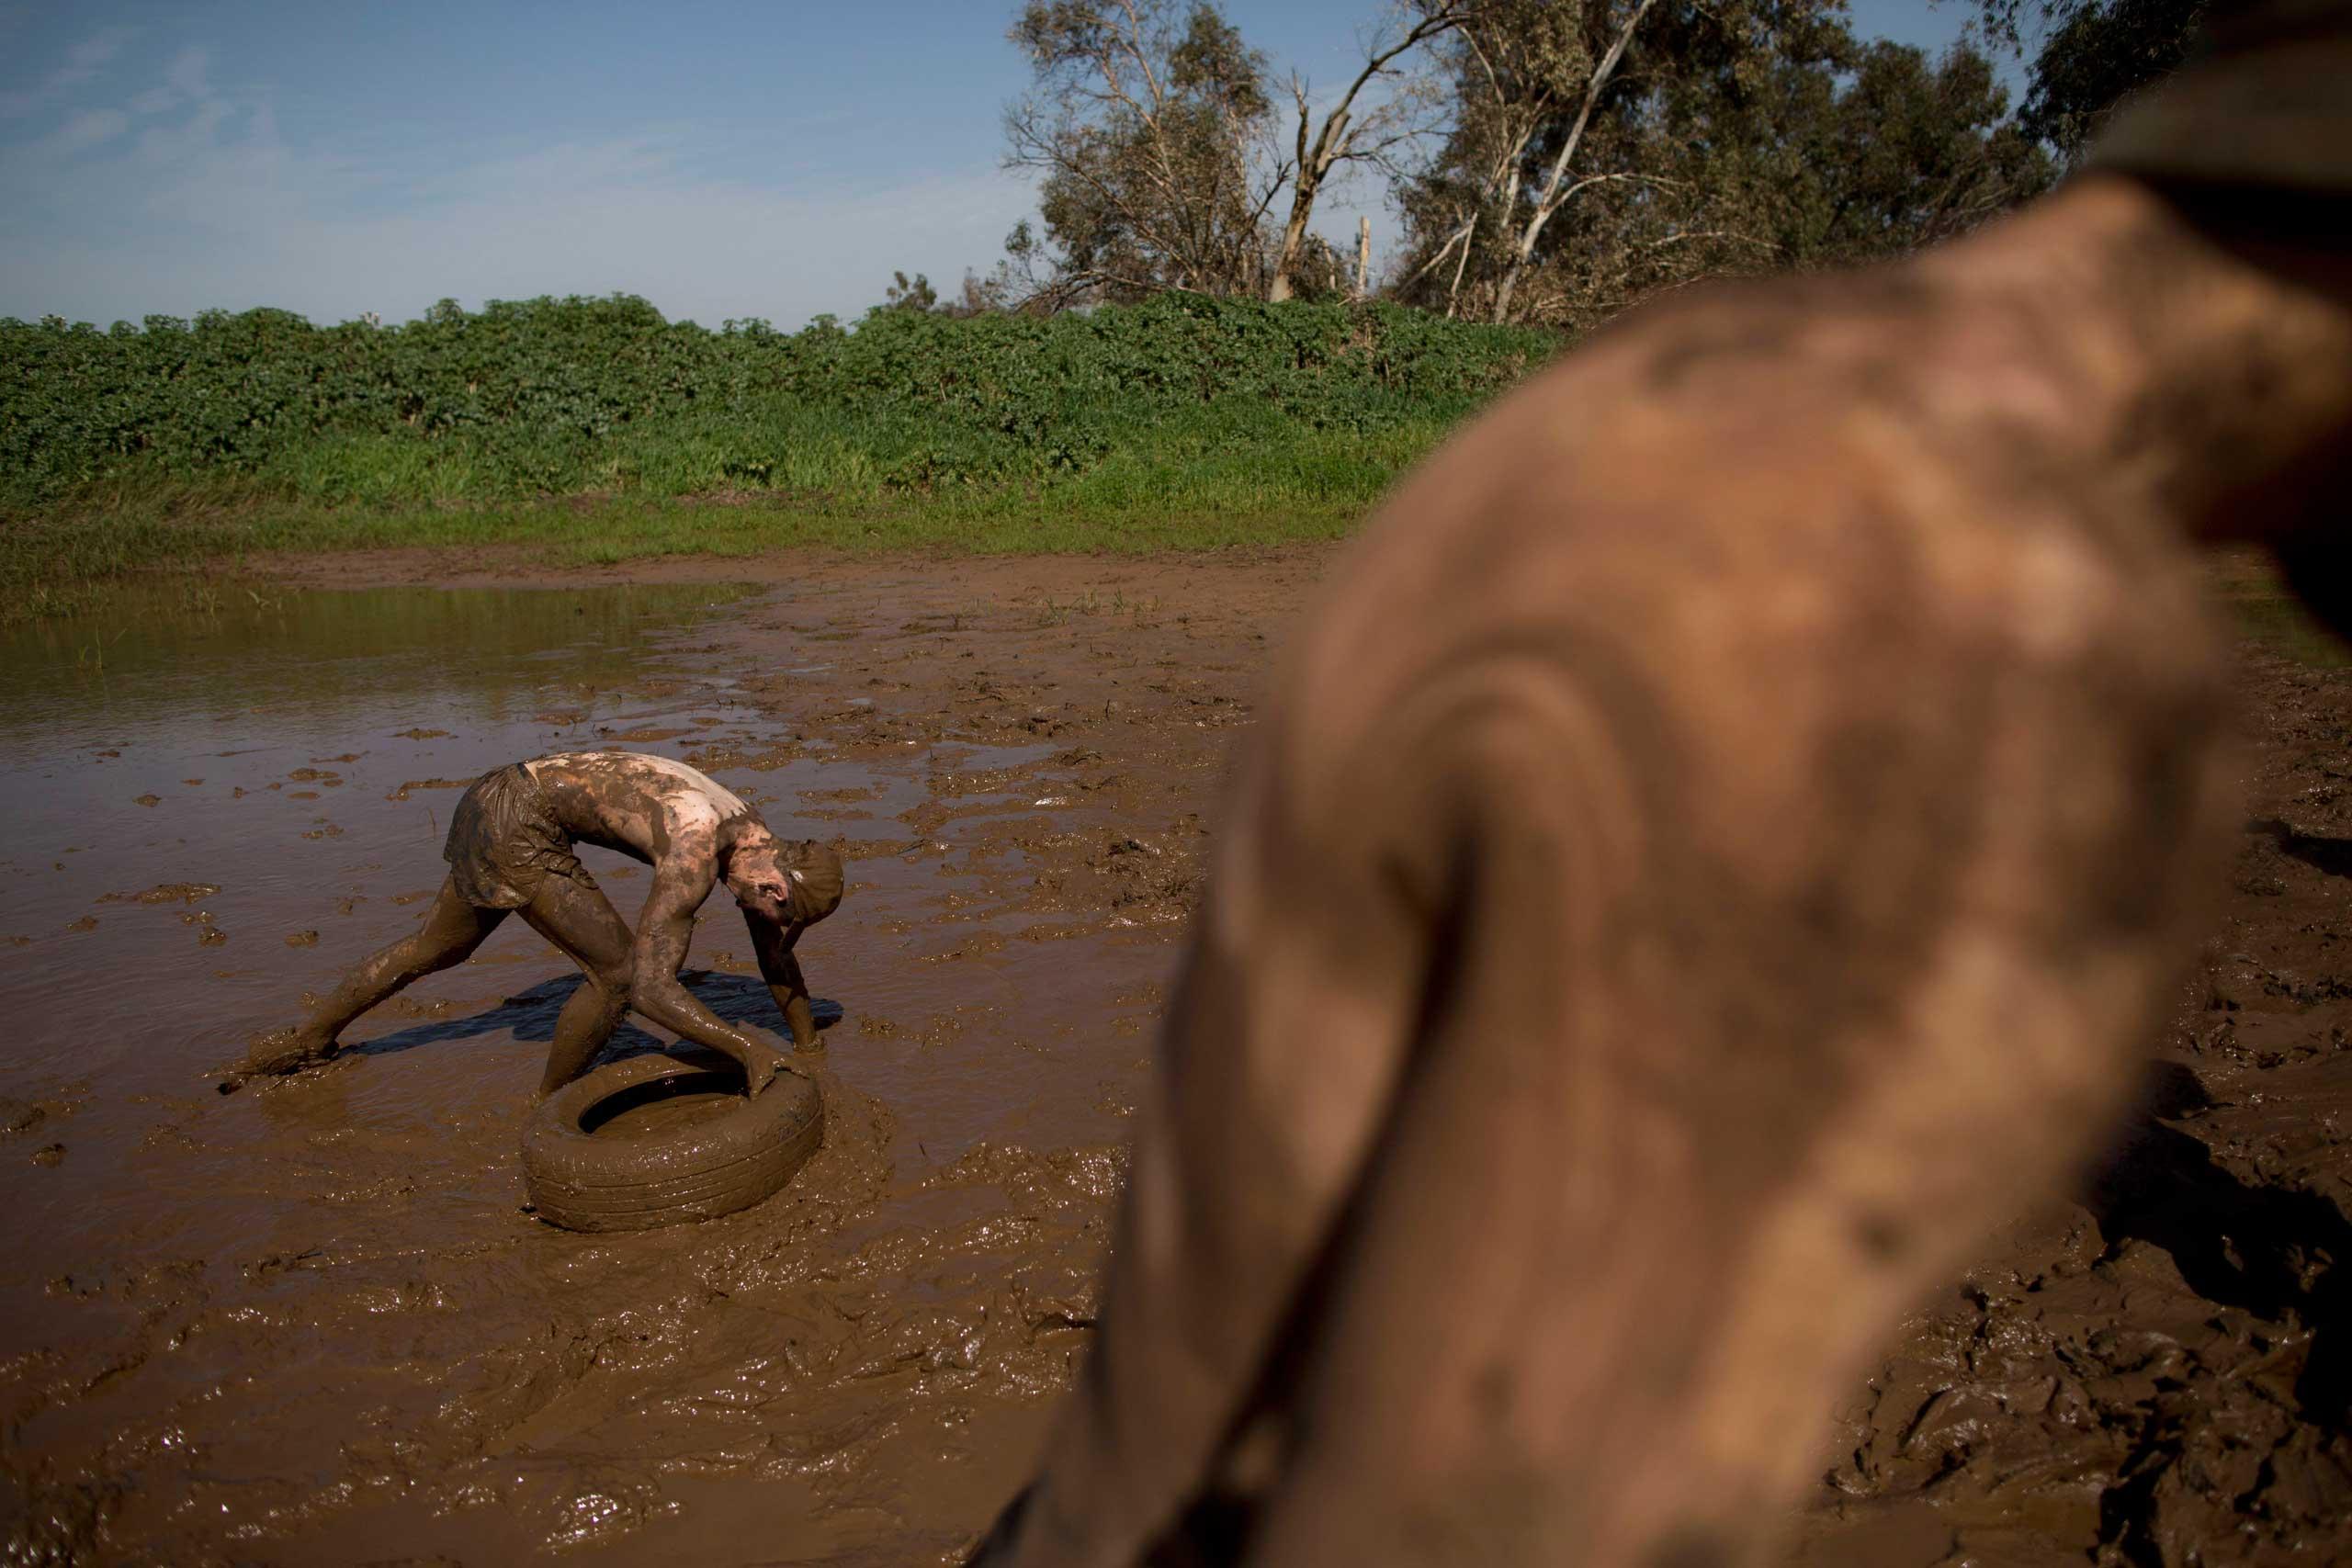 A high-school senior  drags a tire through mud during training near Yakum, central Israel, Feb. 27, 2015.